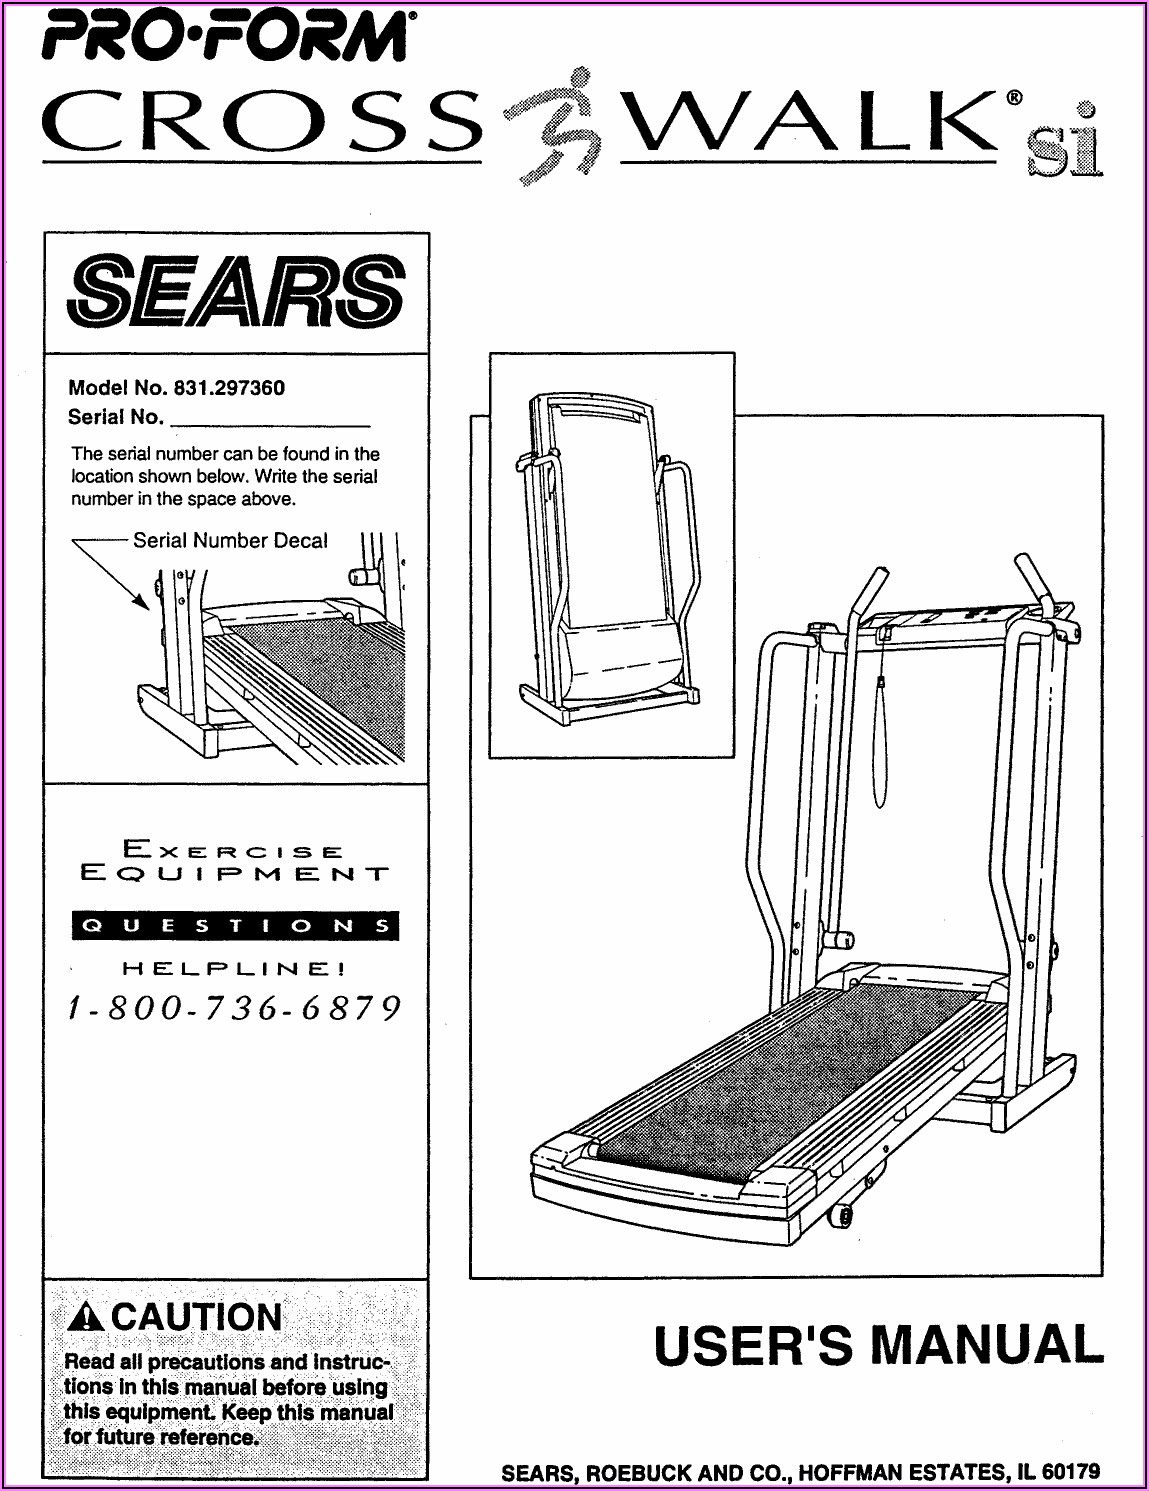 Proform Space Saver Treadmill Manual